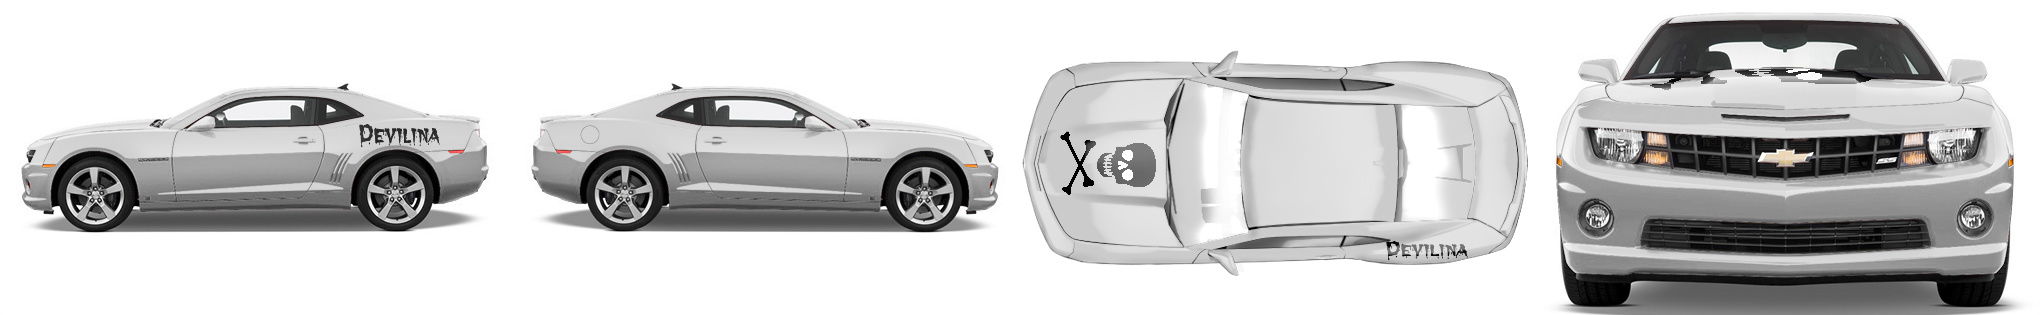 Muscle Car Wrap #51744